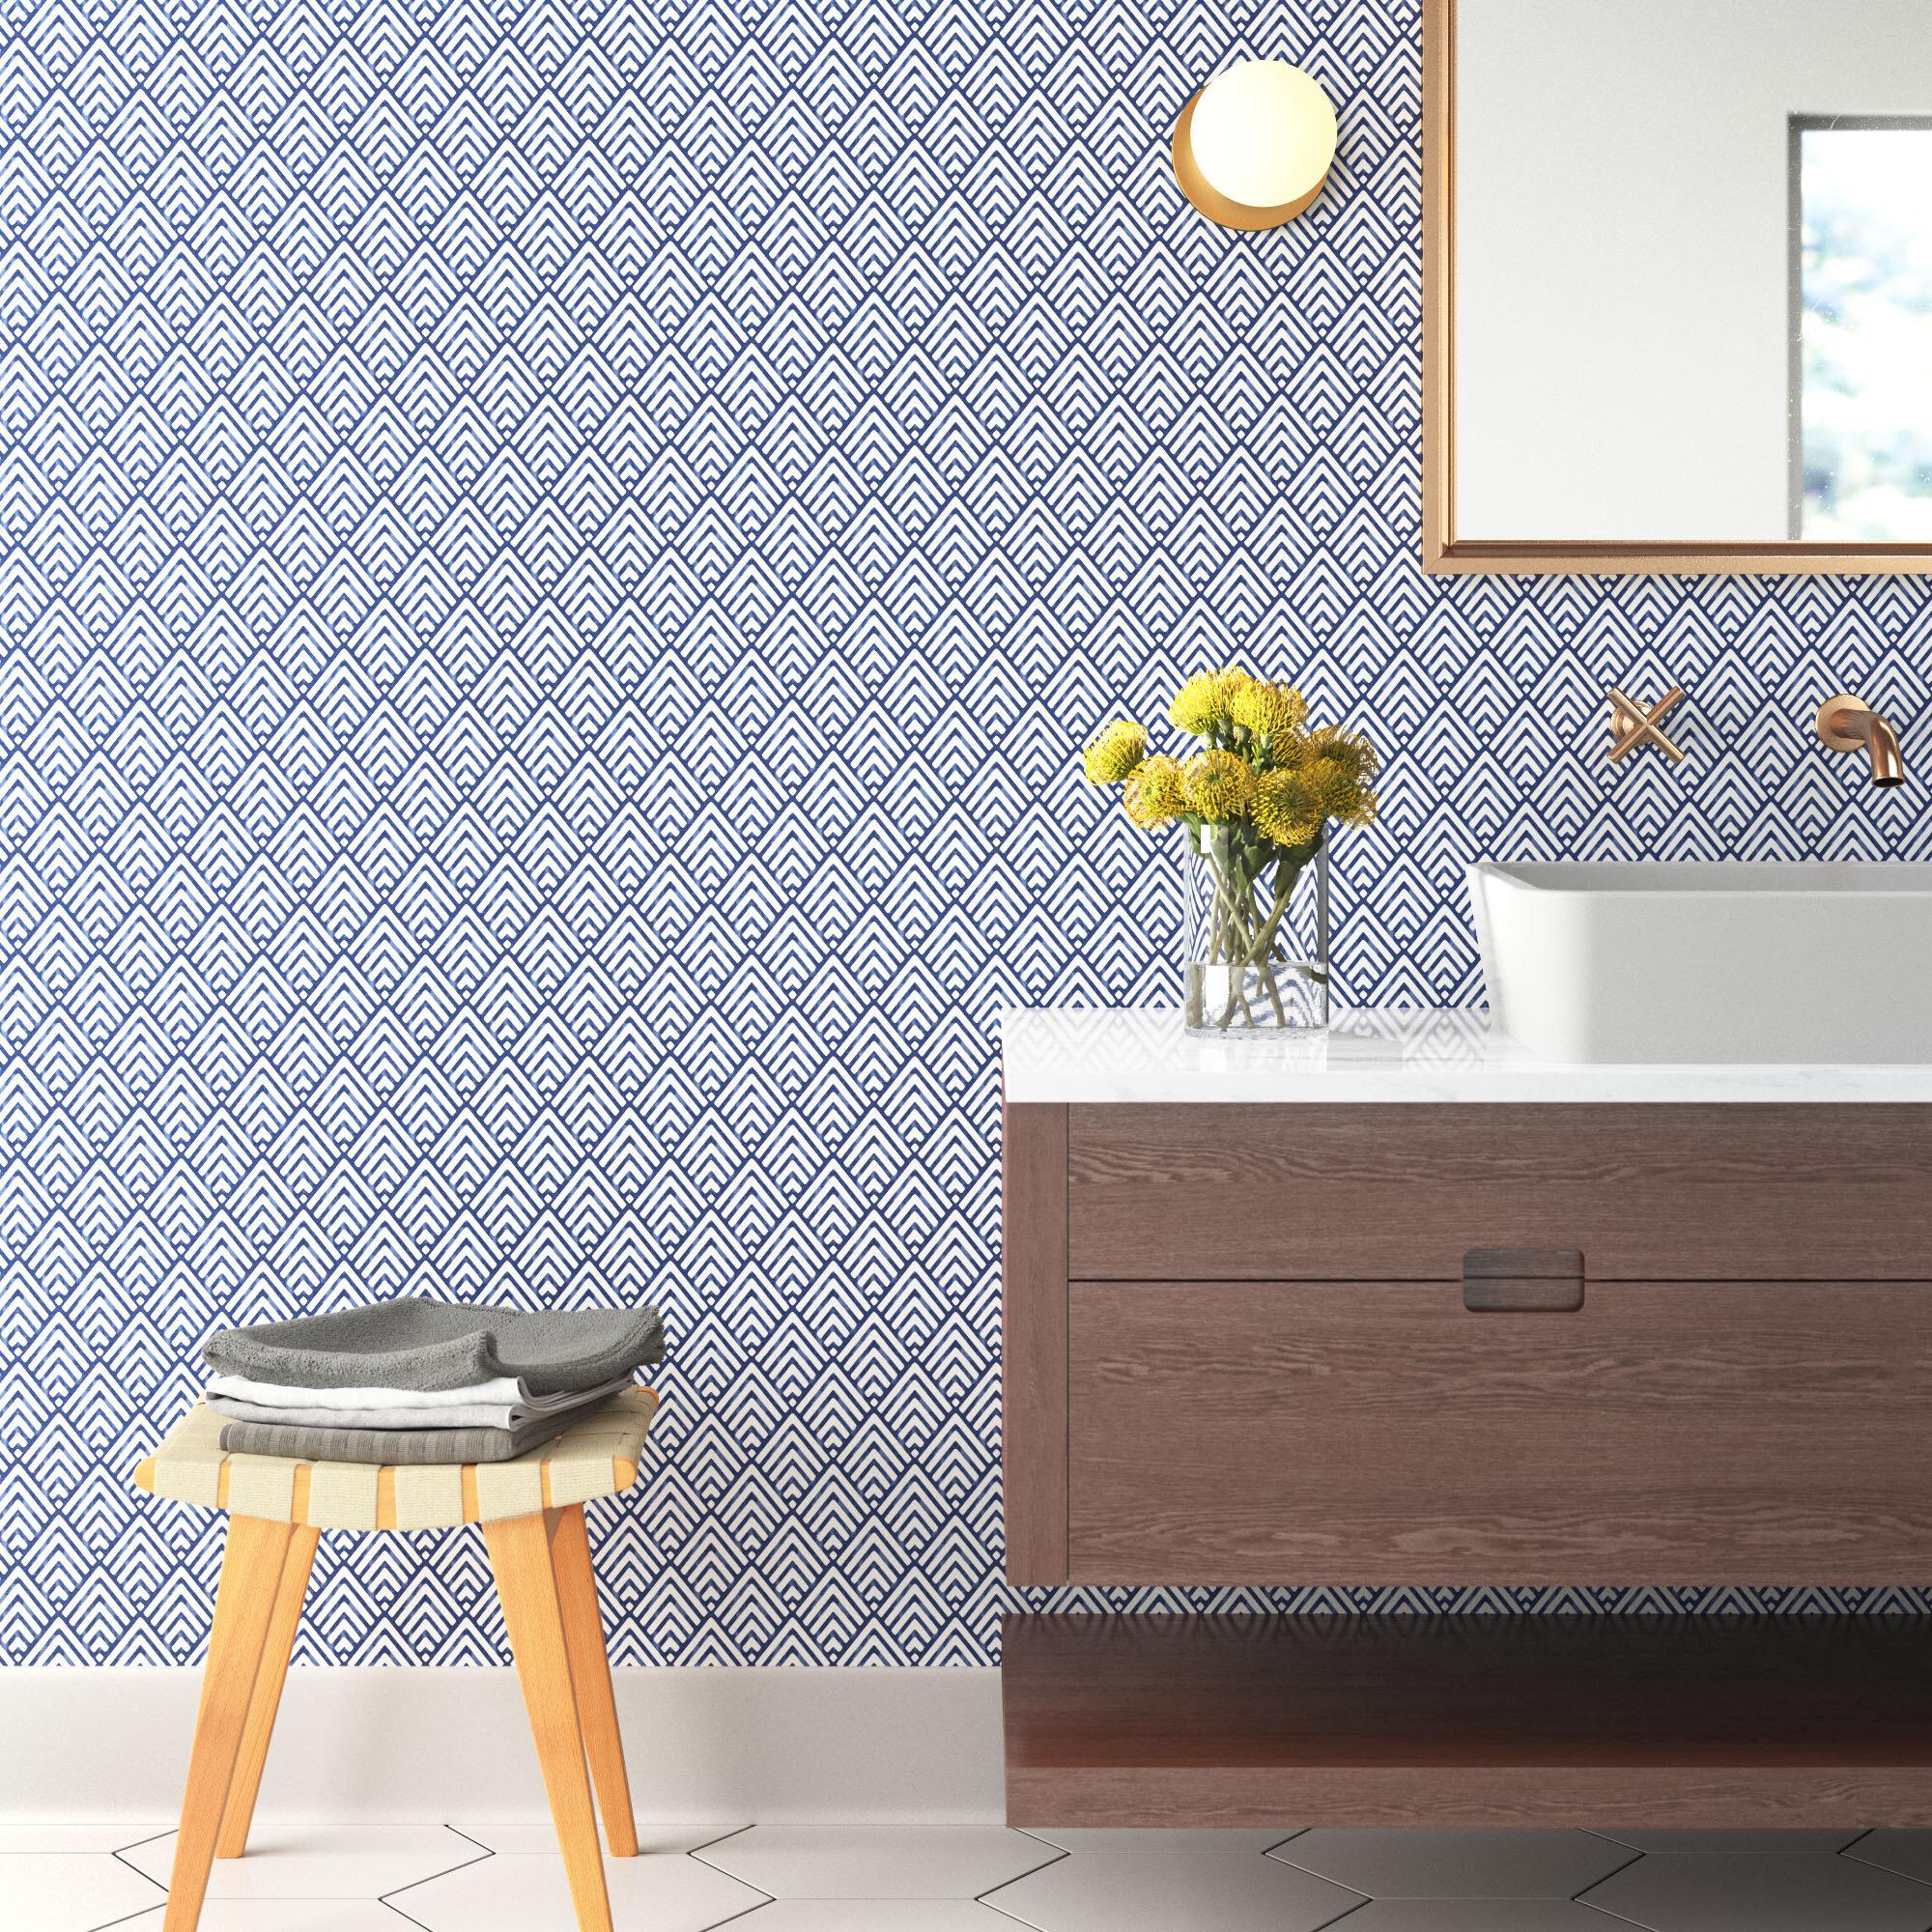 niebrara 18 x 205 smooth peel and stick wallpaper roll